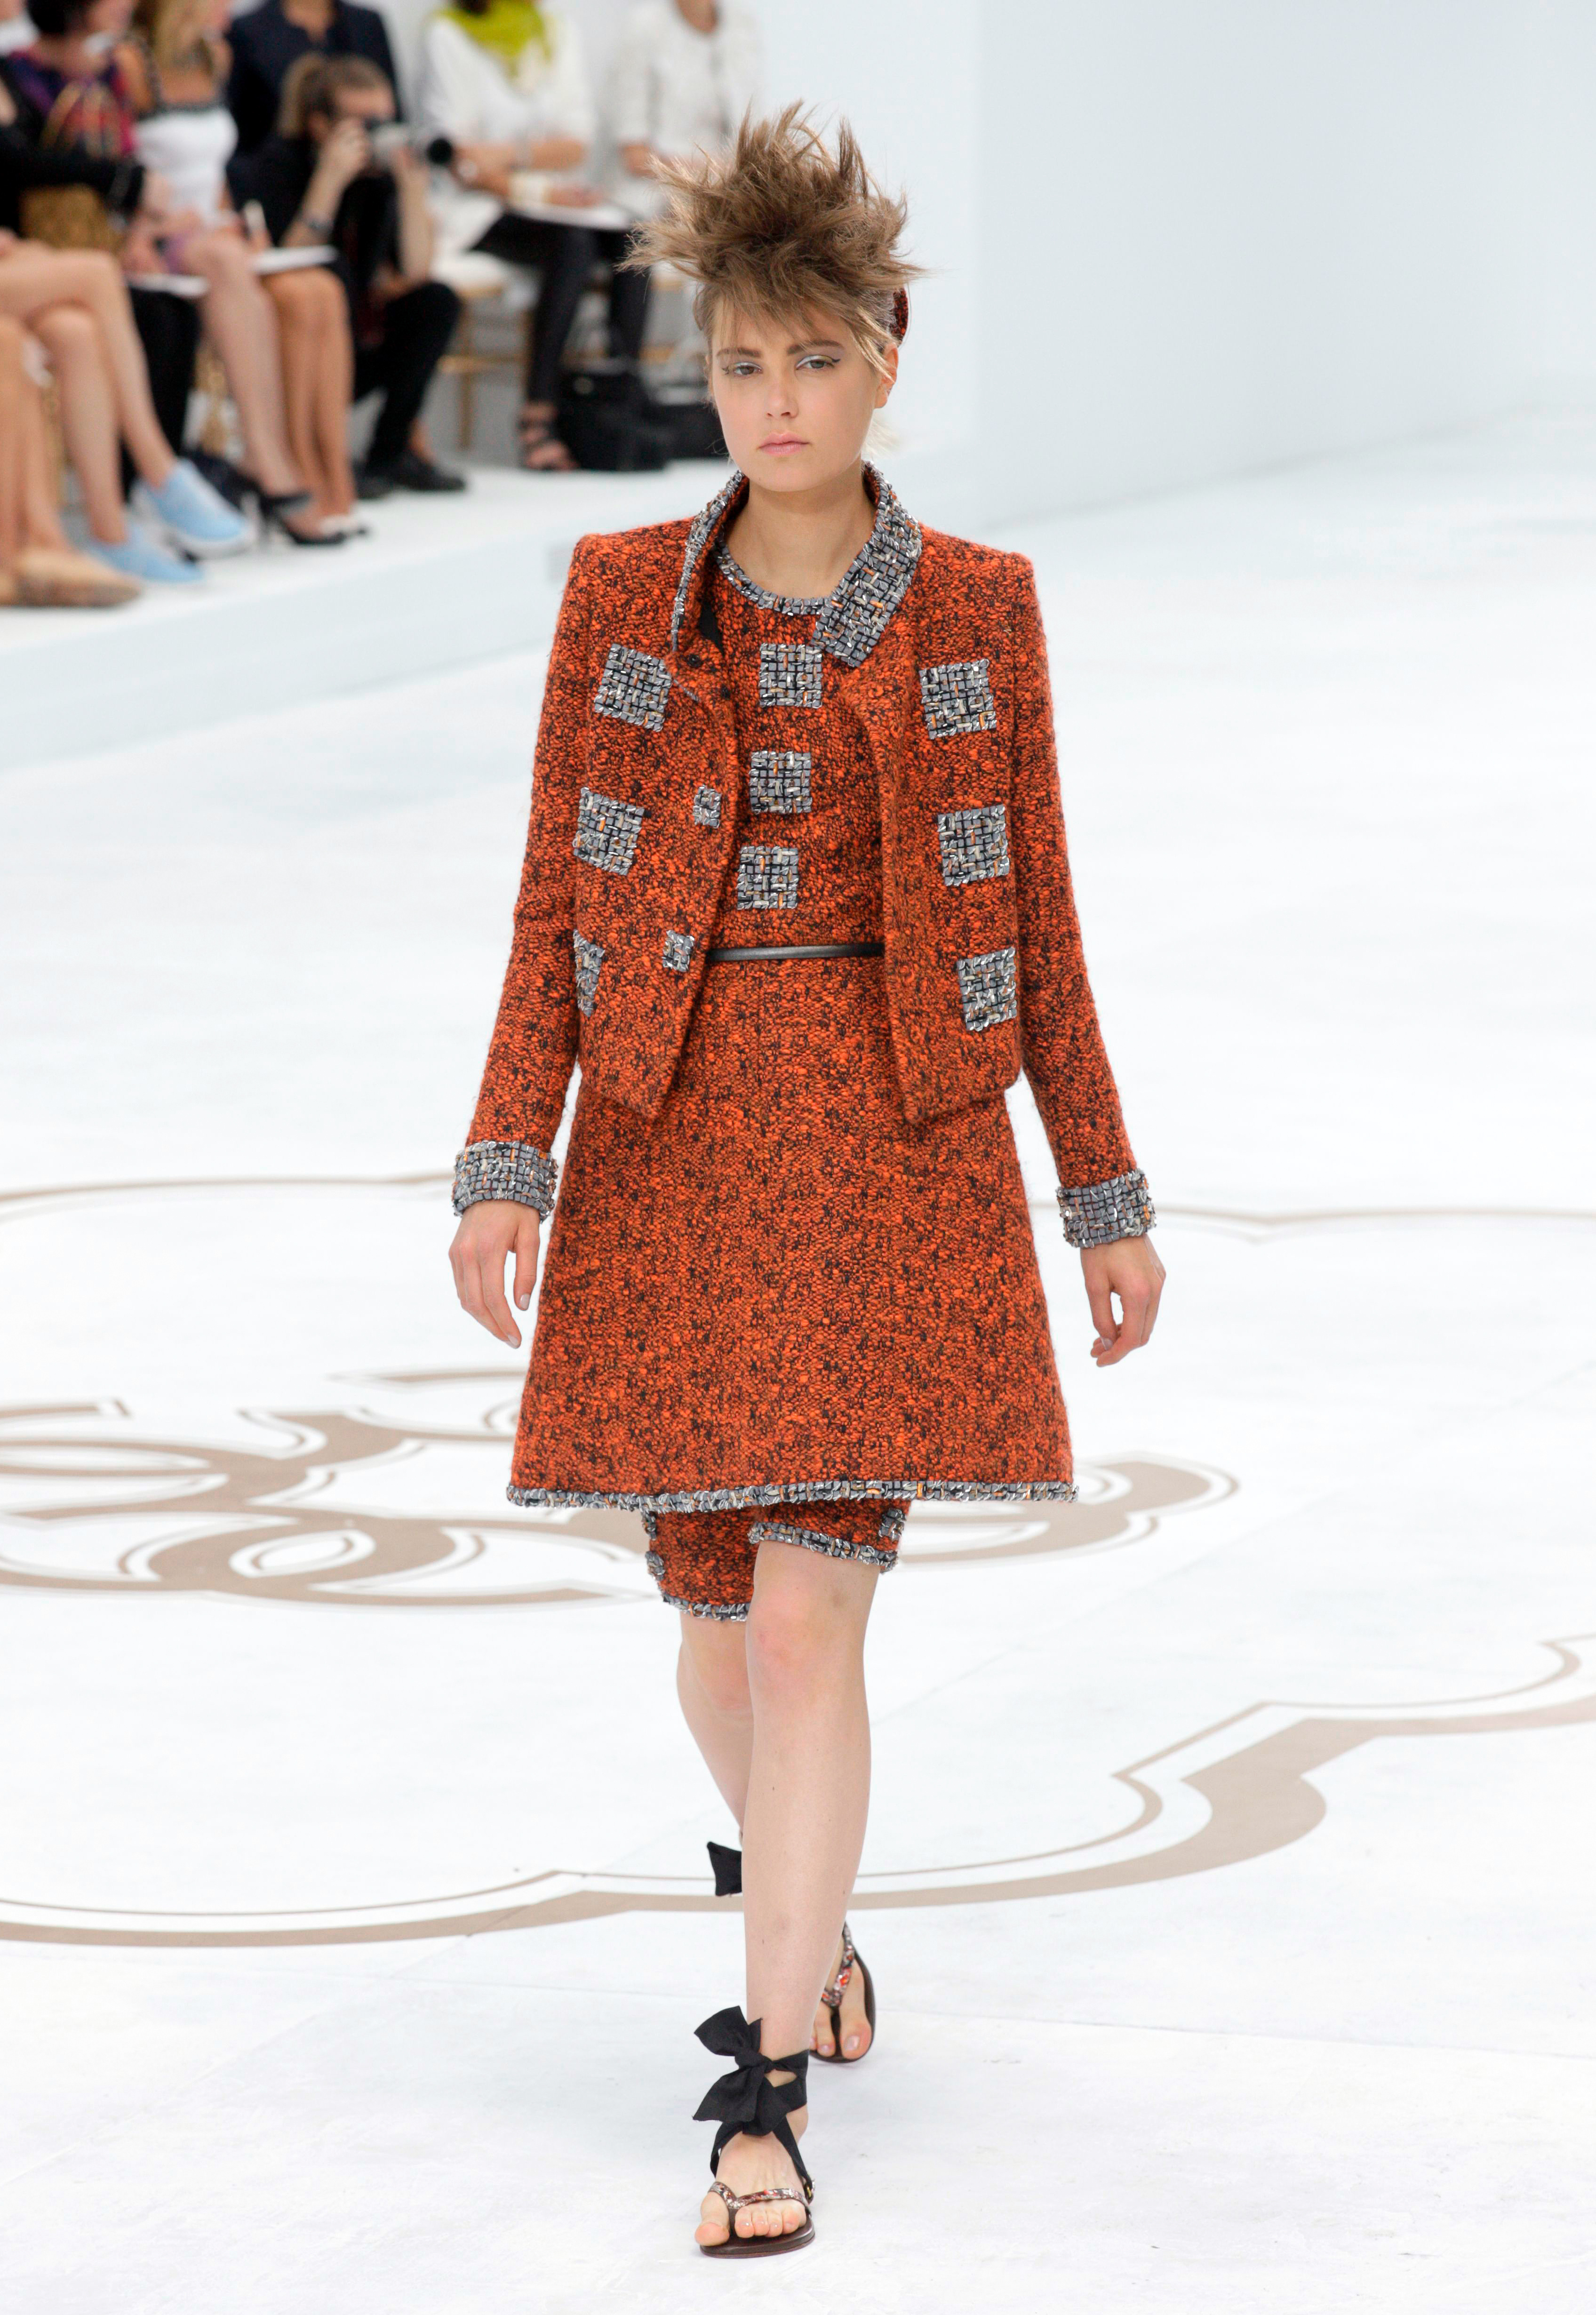 Chanel show, Haute Couture Fall Winter 2014, Paris Fashion Week, France - 08 Jul 2014